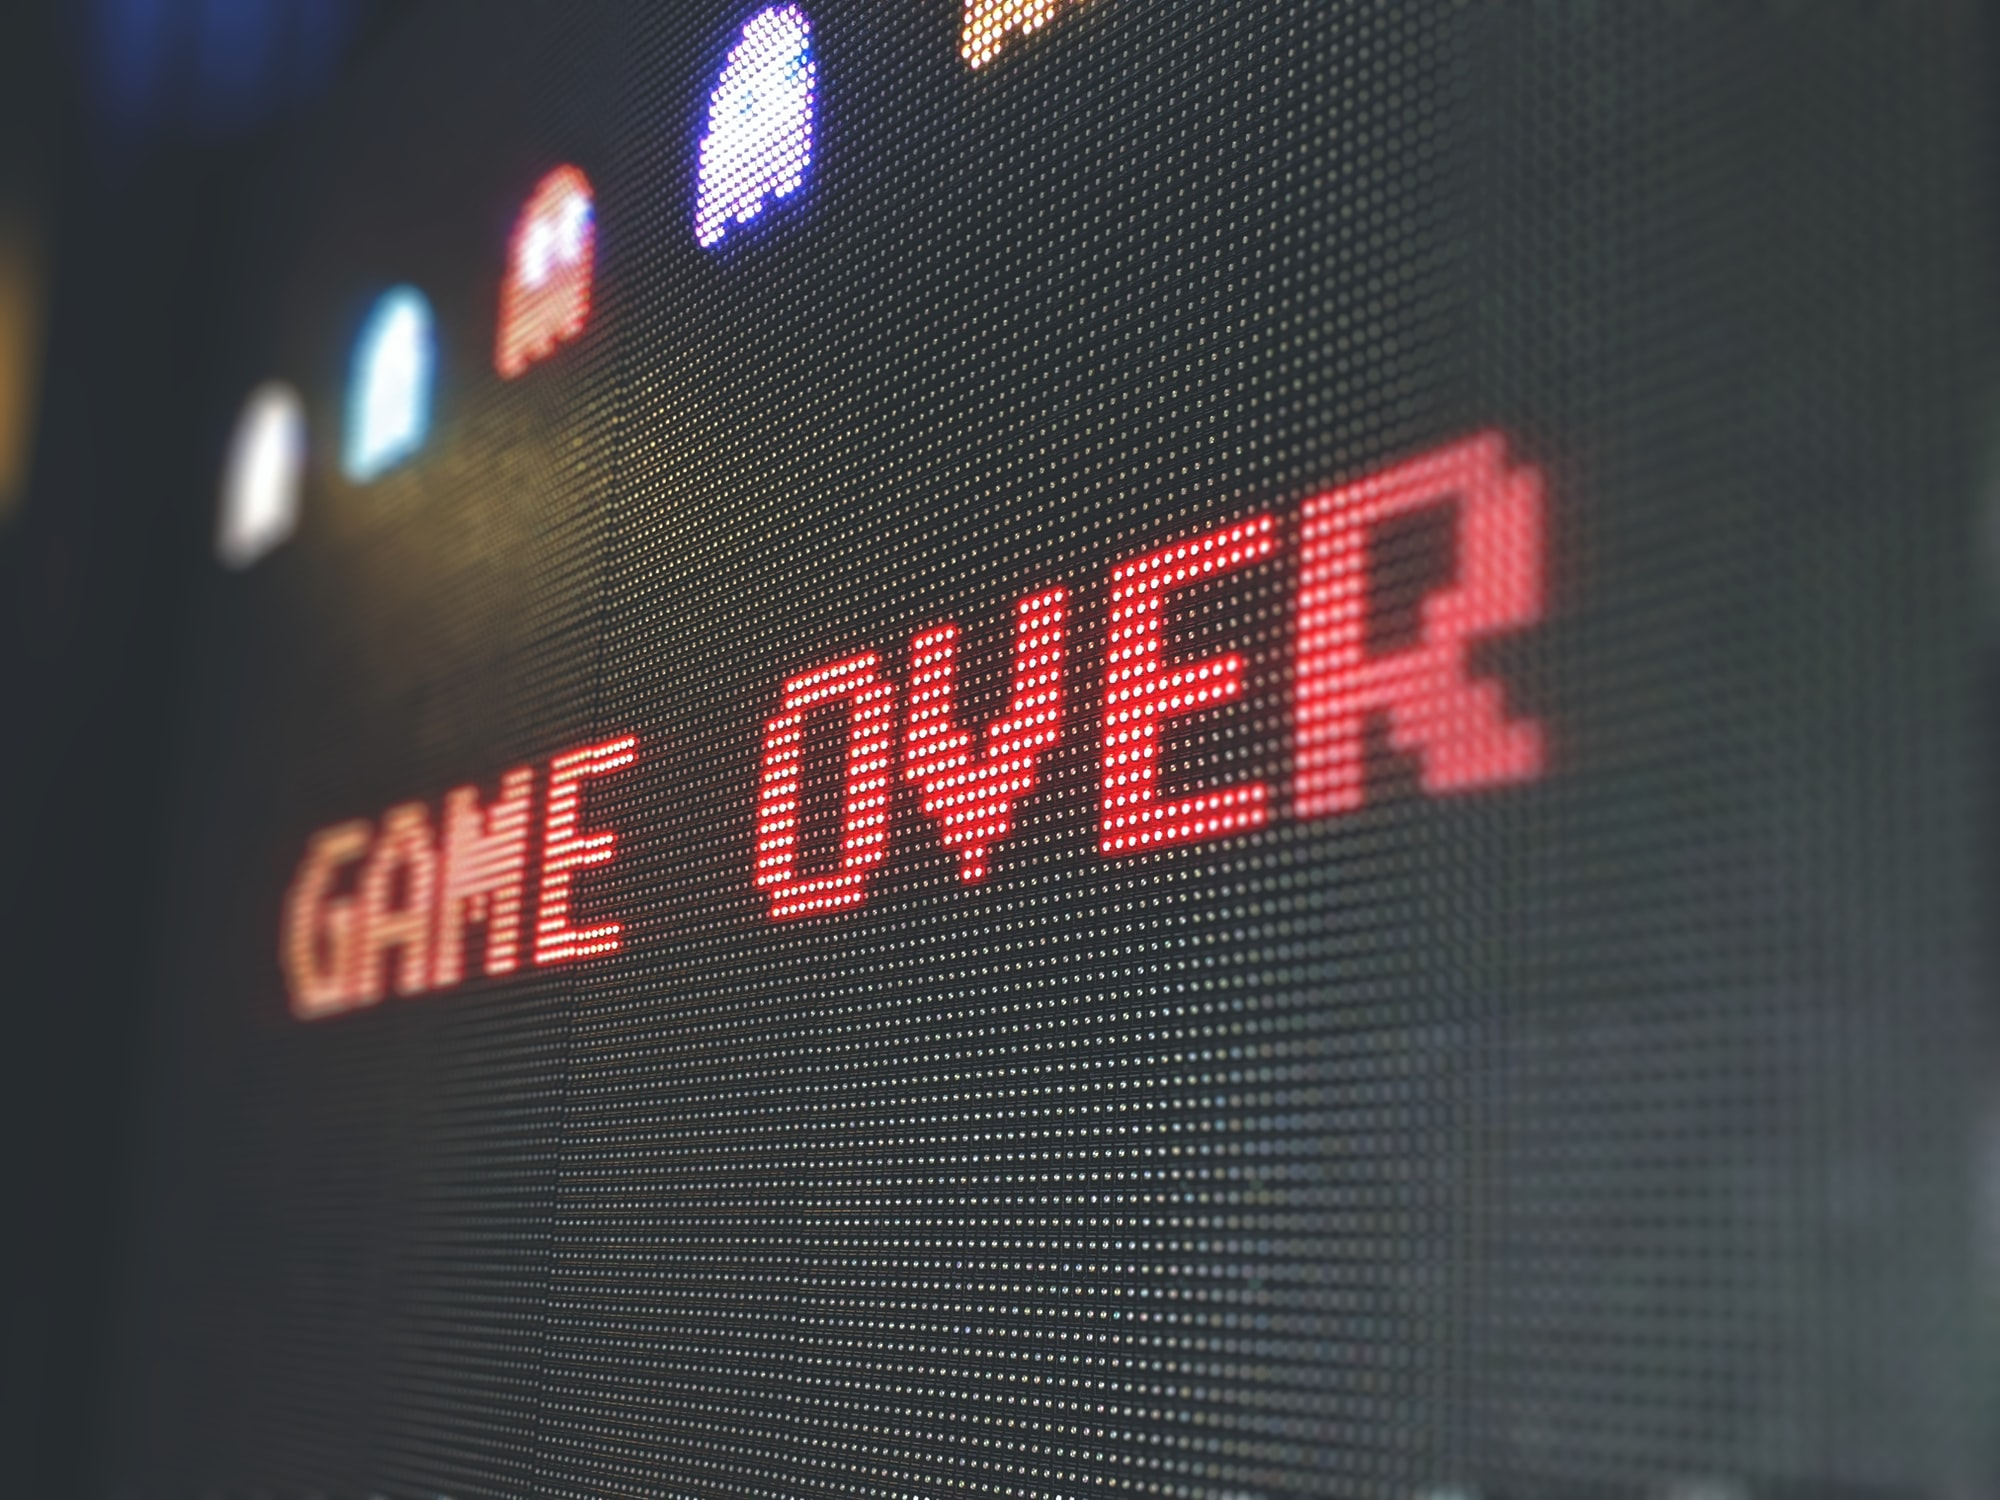 China restricting video-gaming | Daily #163